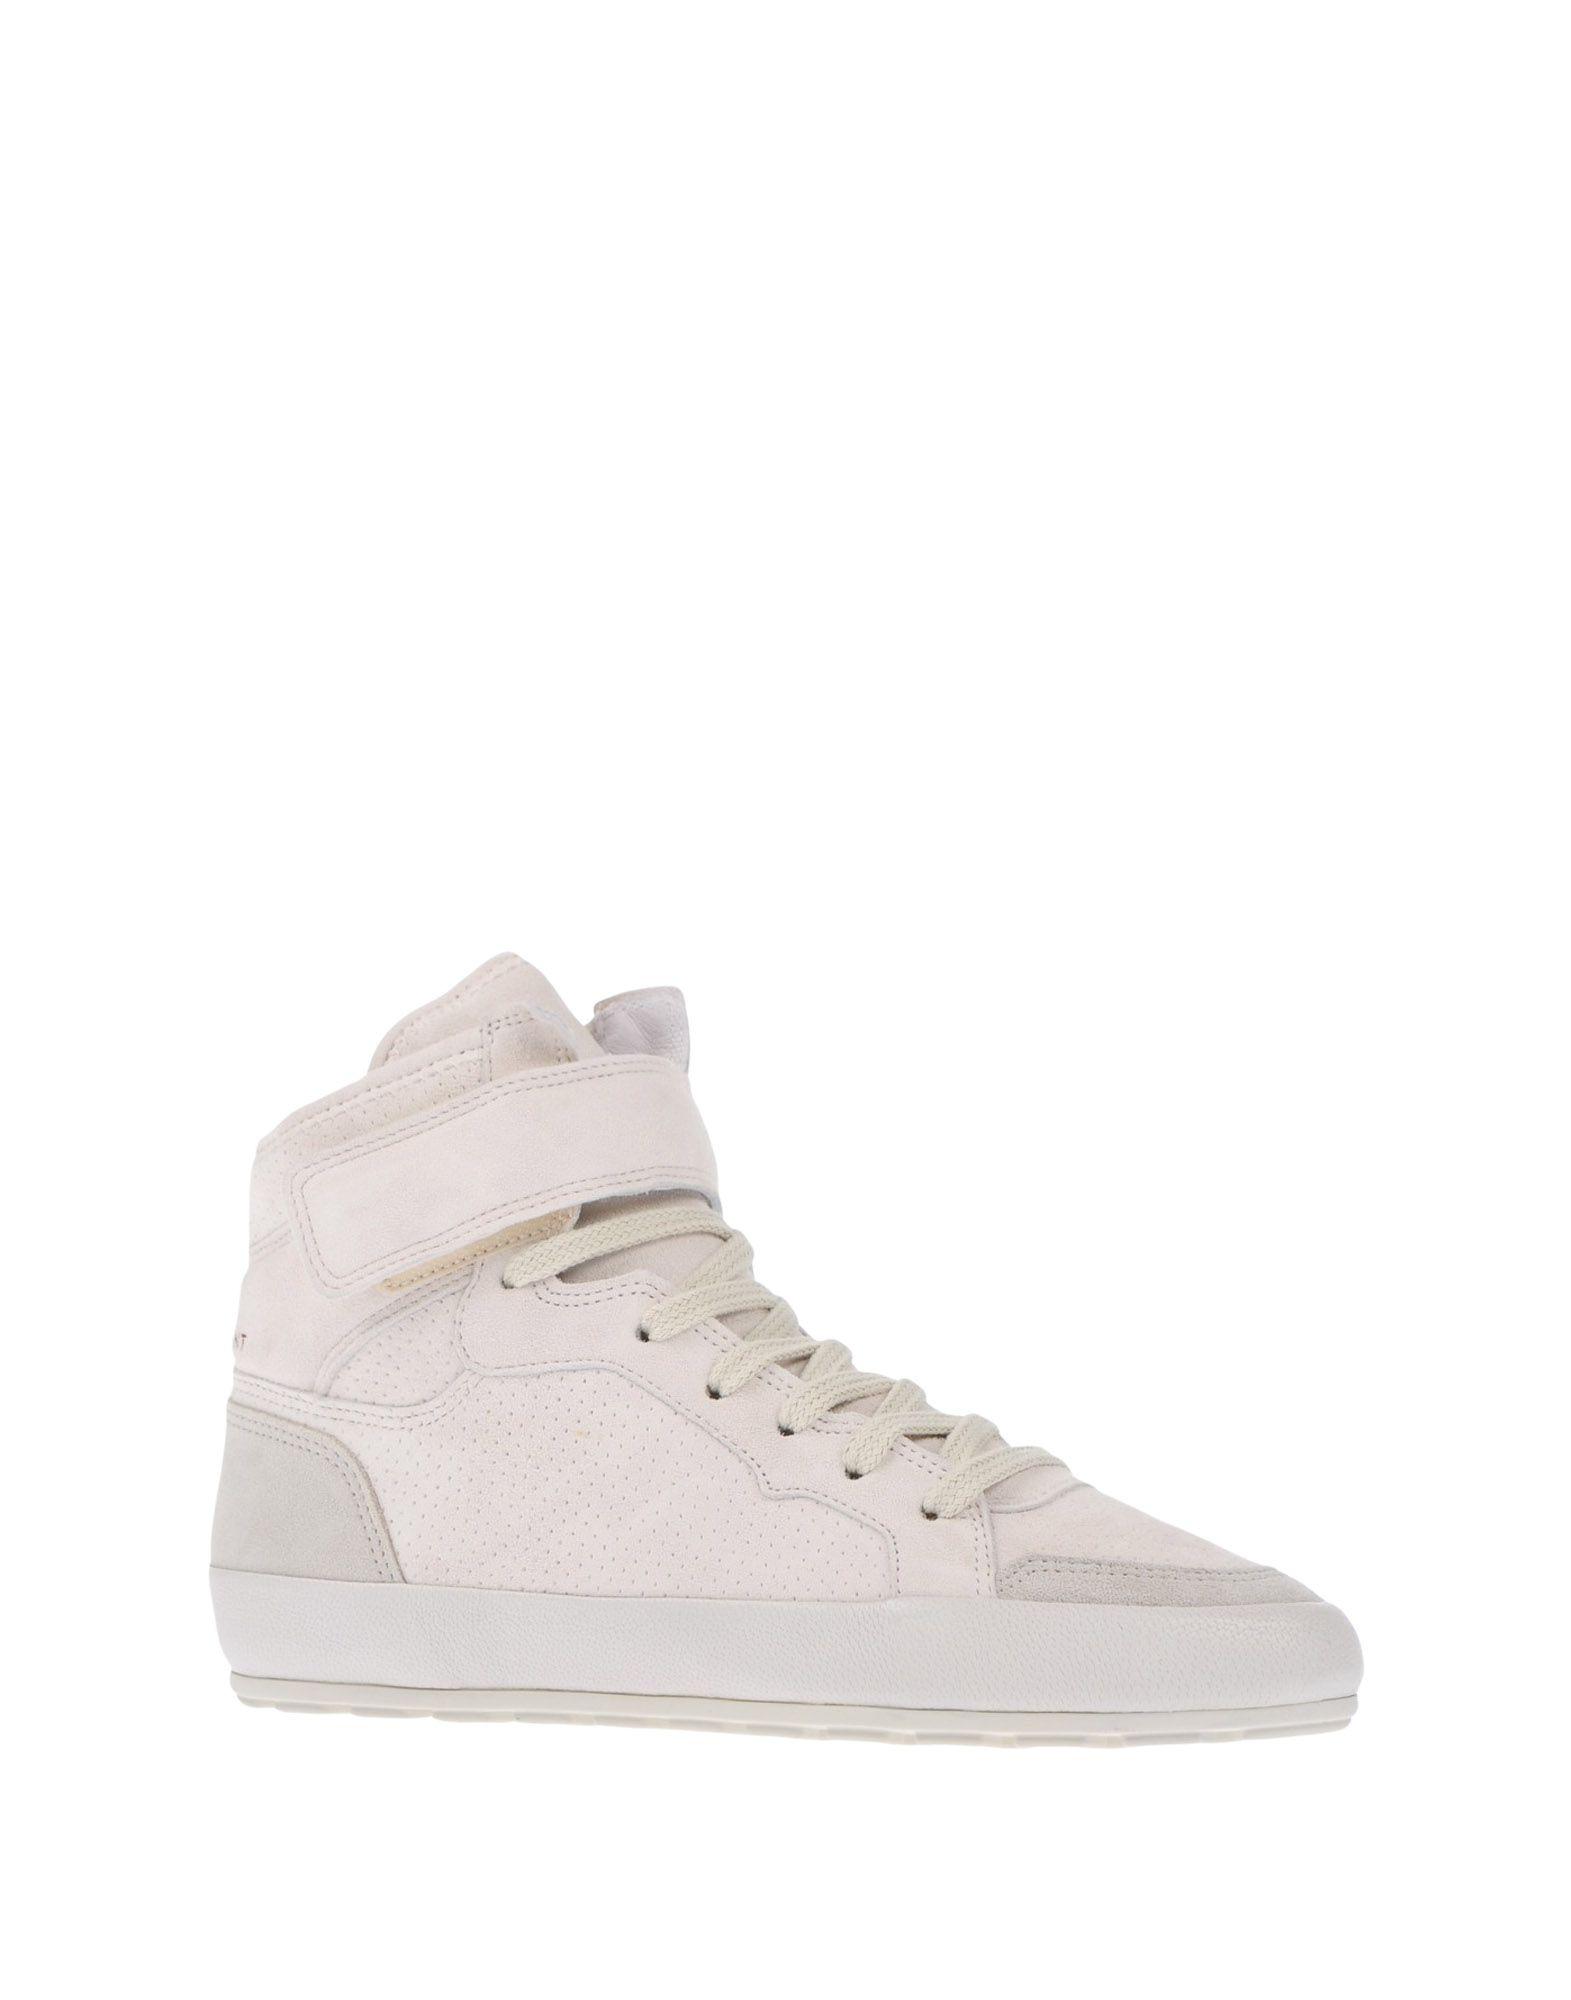 Isabel Marant Étoile Damen Sneakers Damen Étoile  11223497FG Neue Schuhe a0fe53